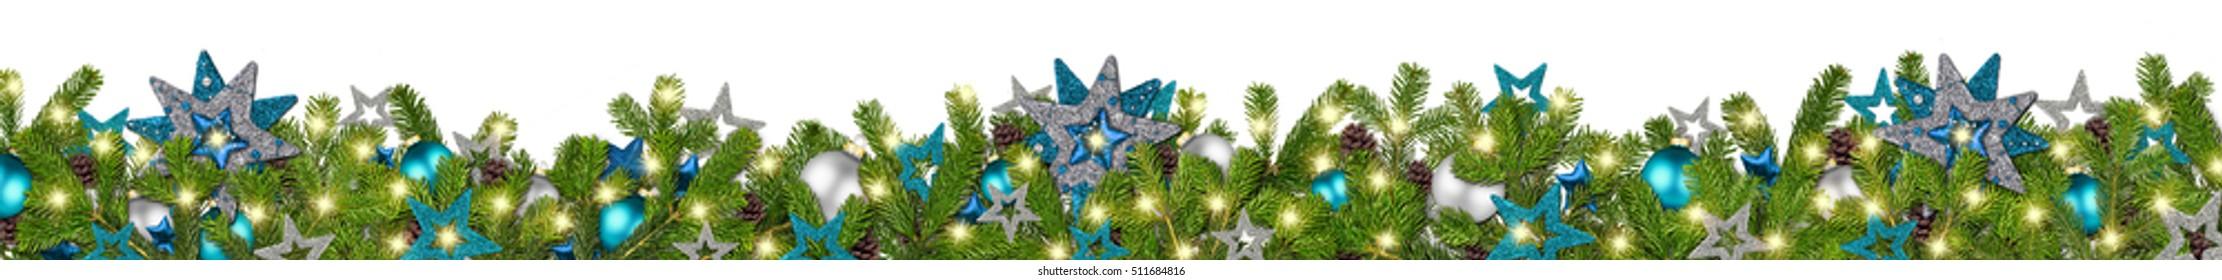 christmas garland images stock photos vectors shutterstock